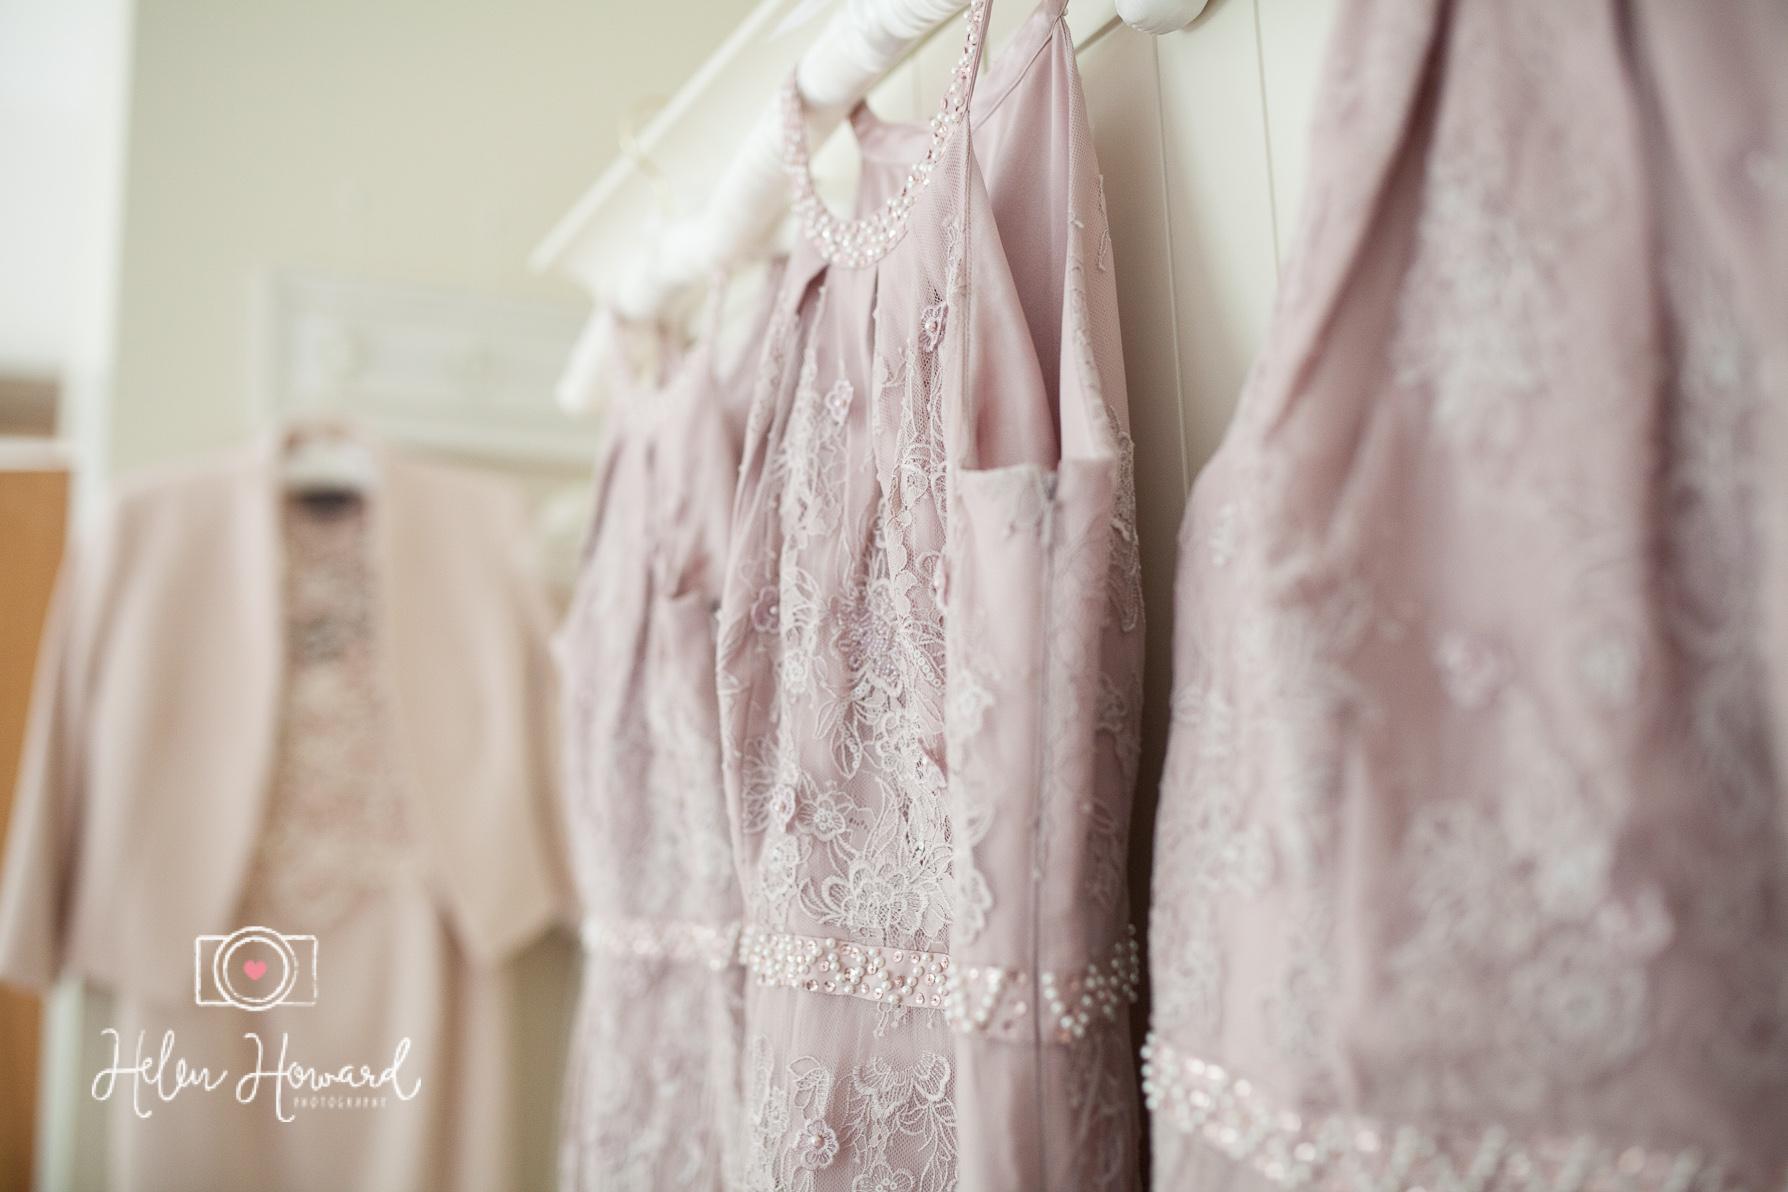 Helen Howard Photography Packington Moor Wedding-4.jpg